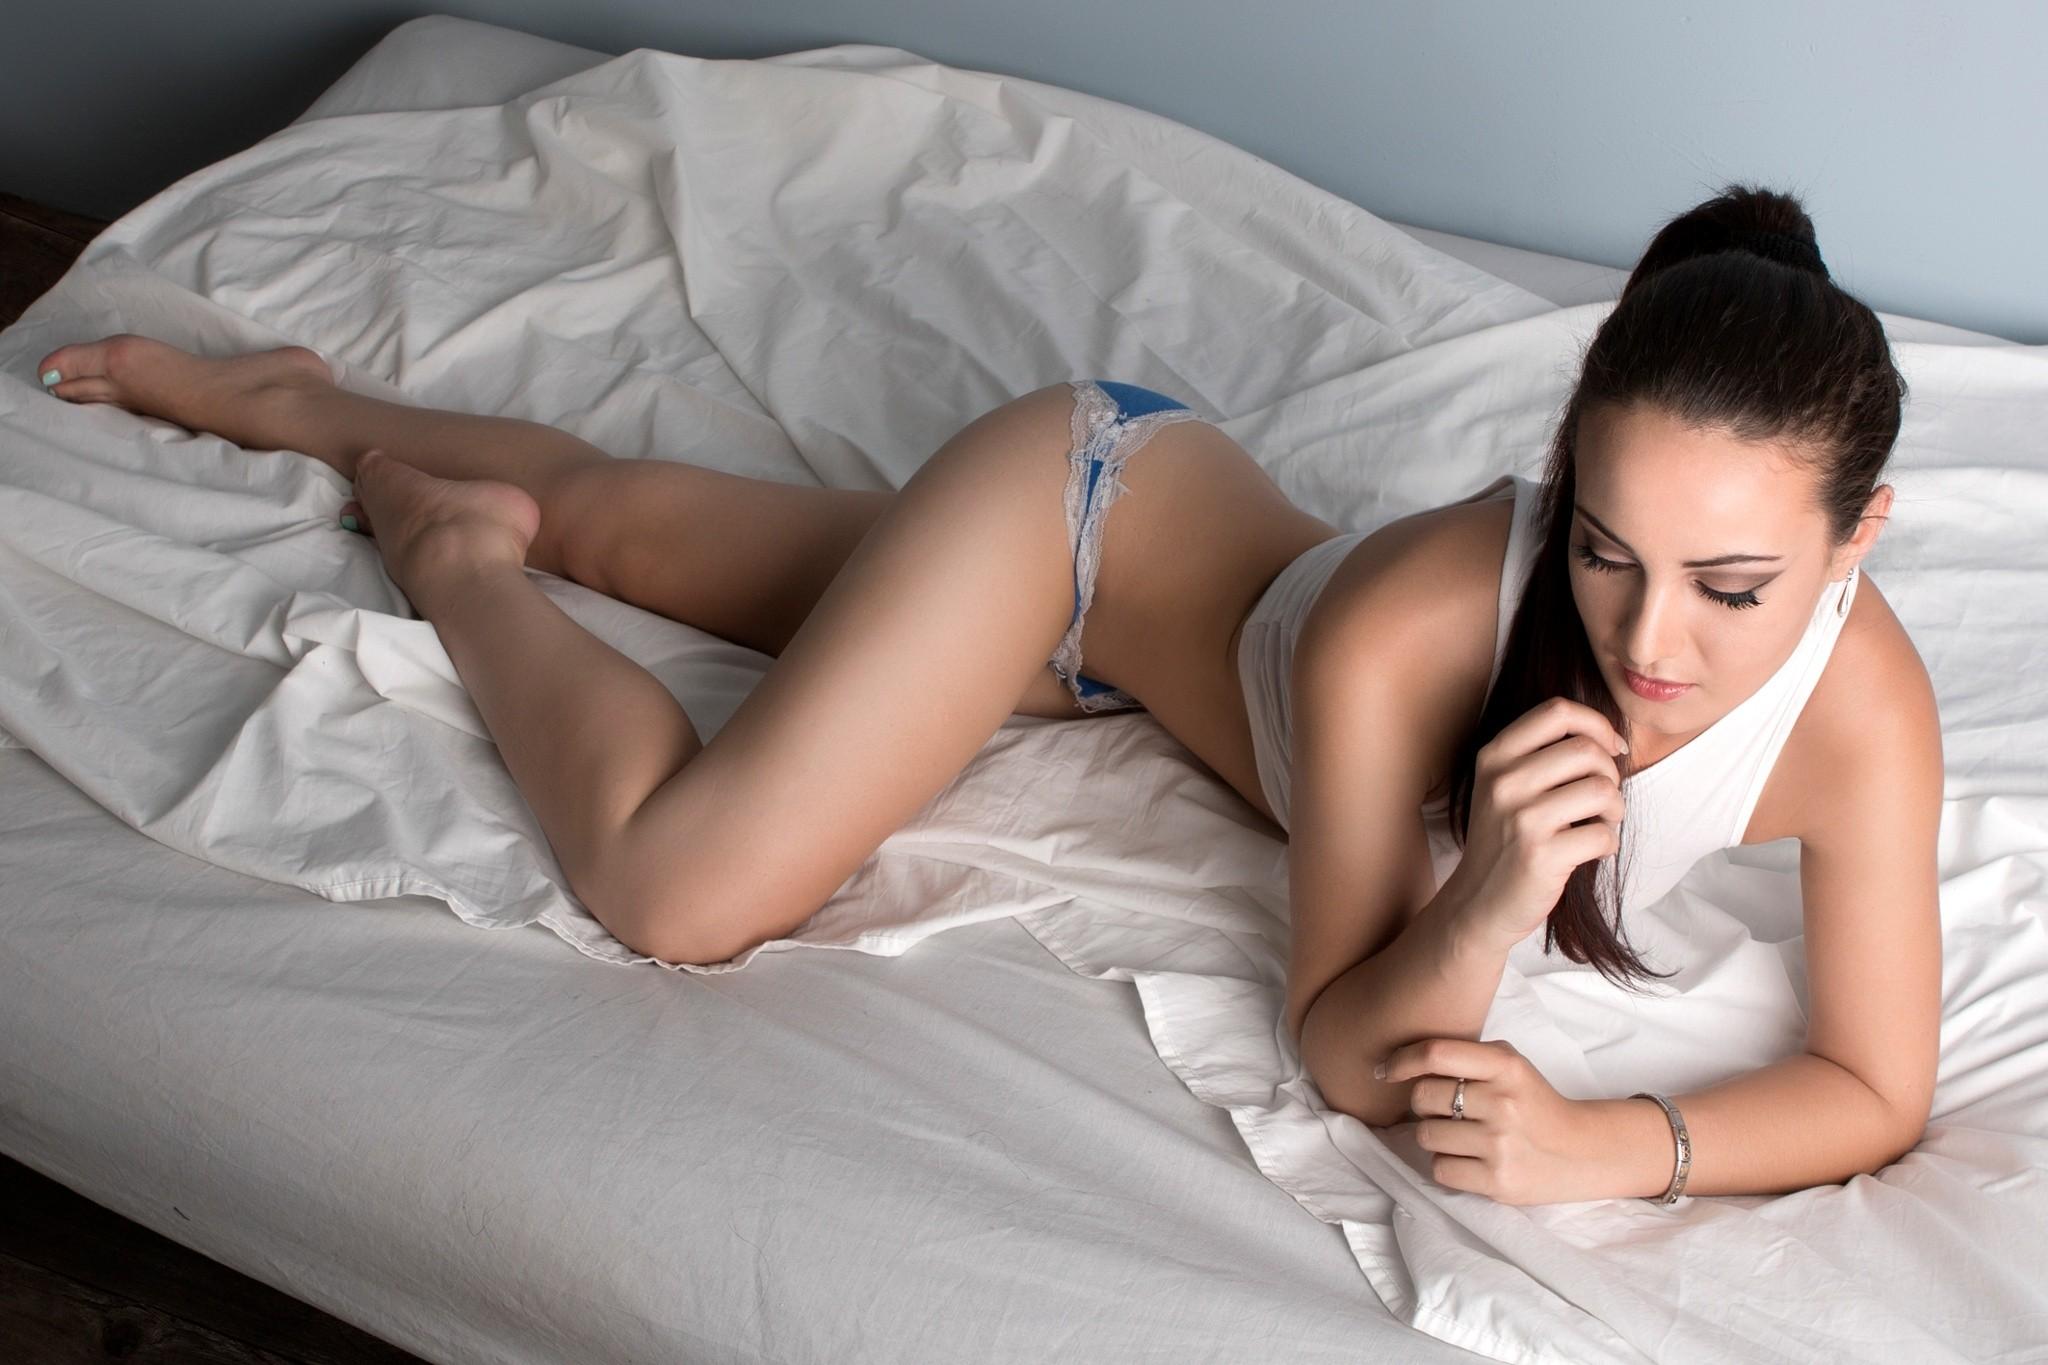 onlayn-devushka-v-trusikah-russkoe-porno-s-krasivimi-zhenami